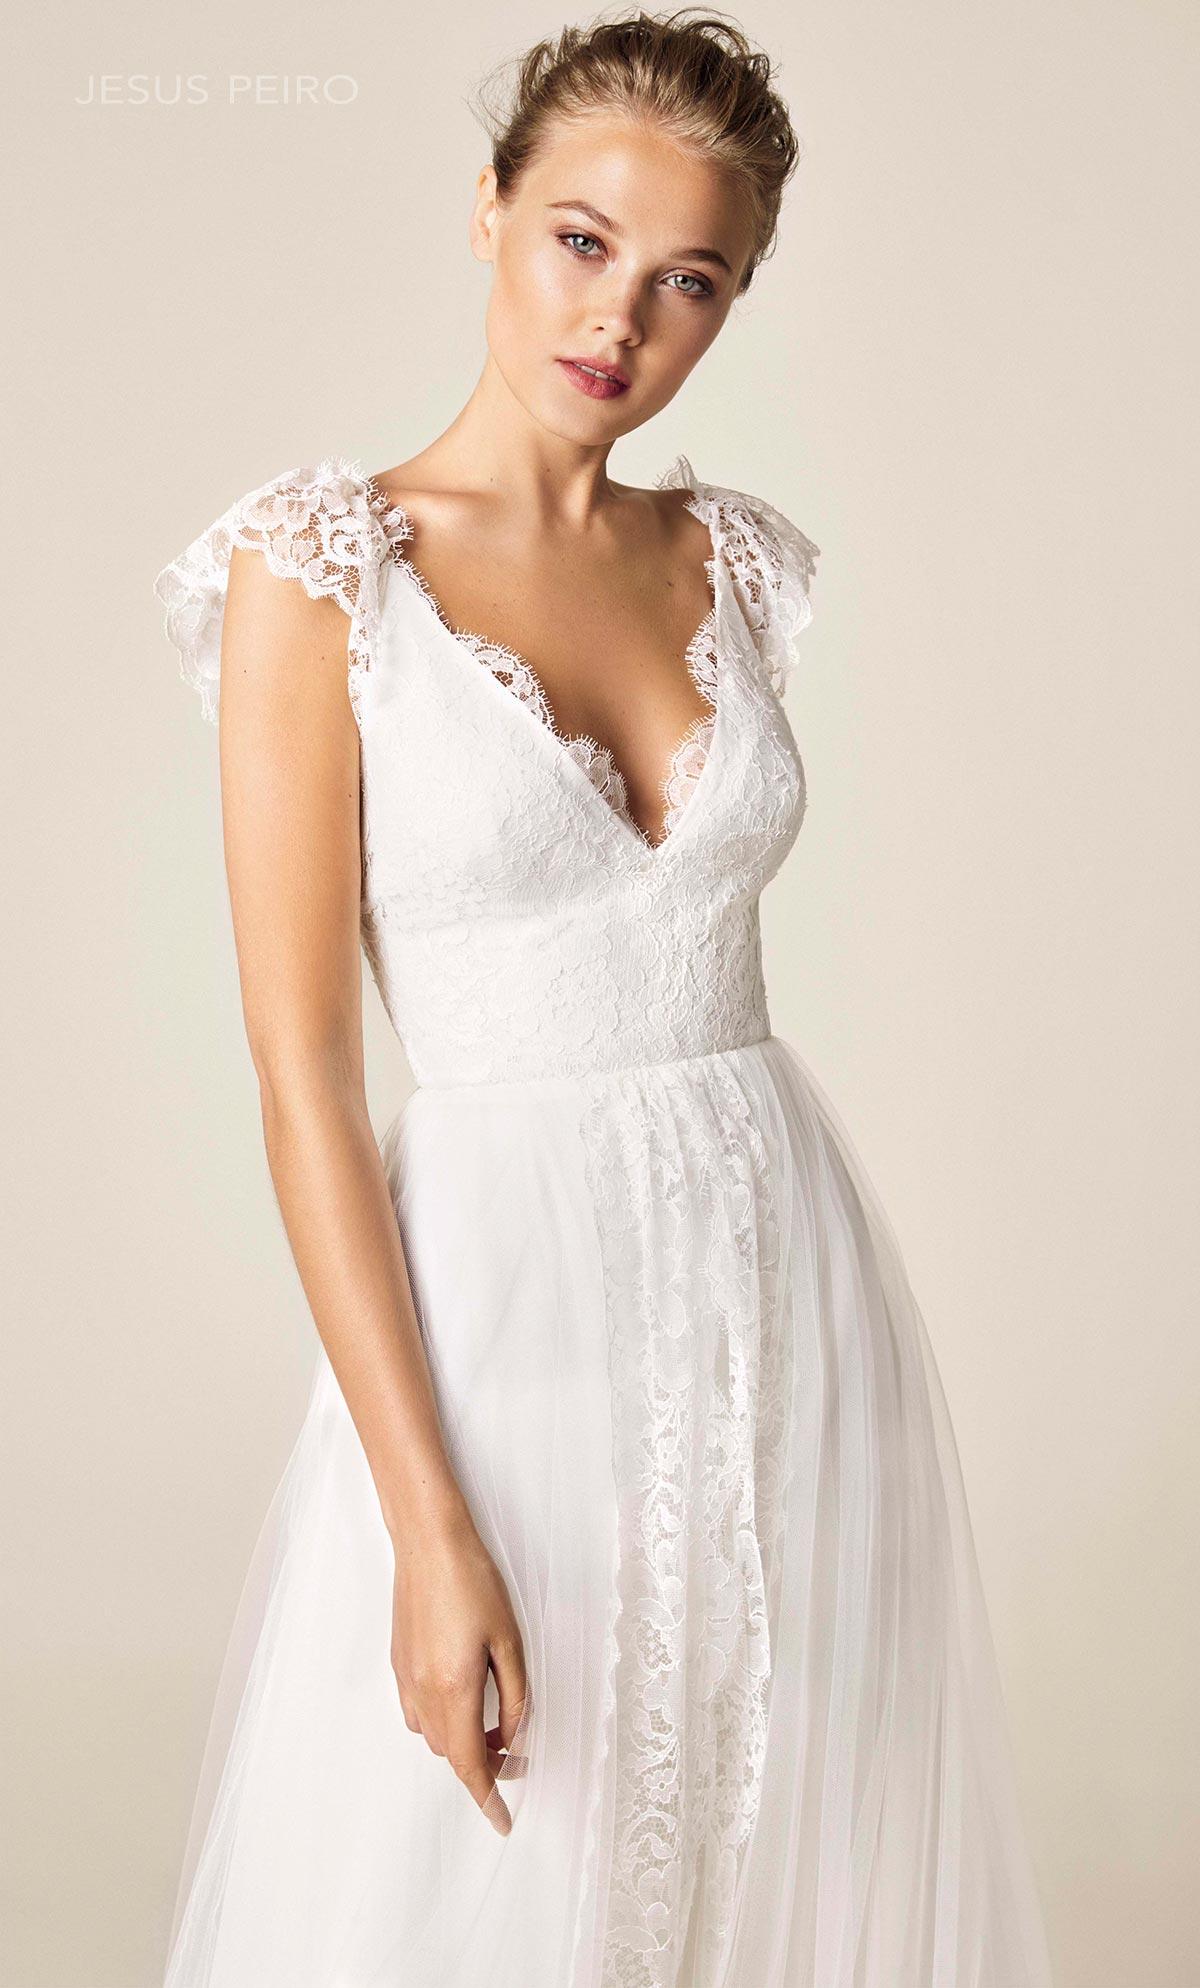 Vestido novia Jesús Peiró Ref.951